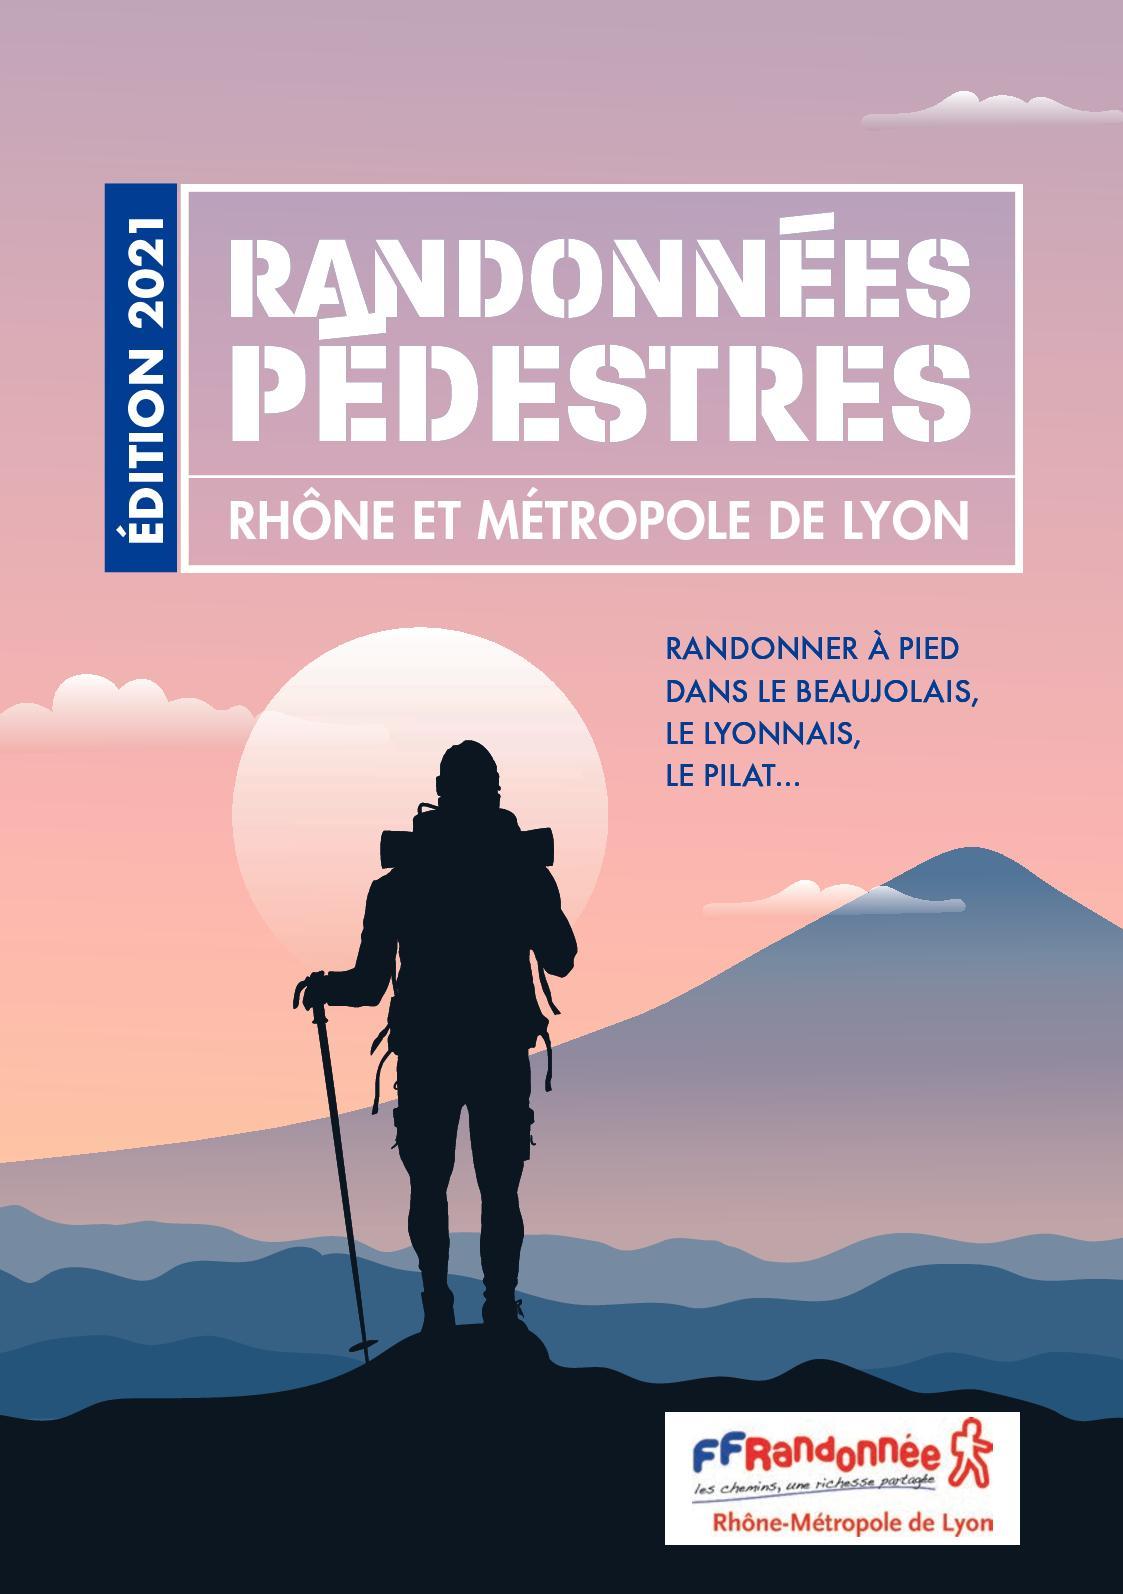 Calendrier Randonnée Rhone 2022 Calaméo   FFFRandonnée Rhône Calendrier 2021